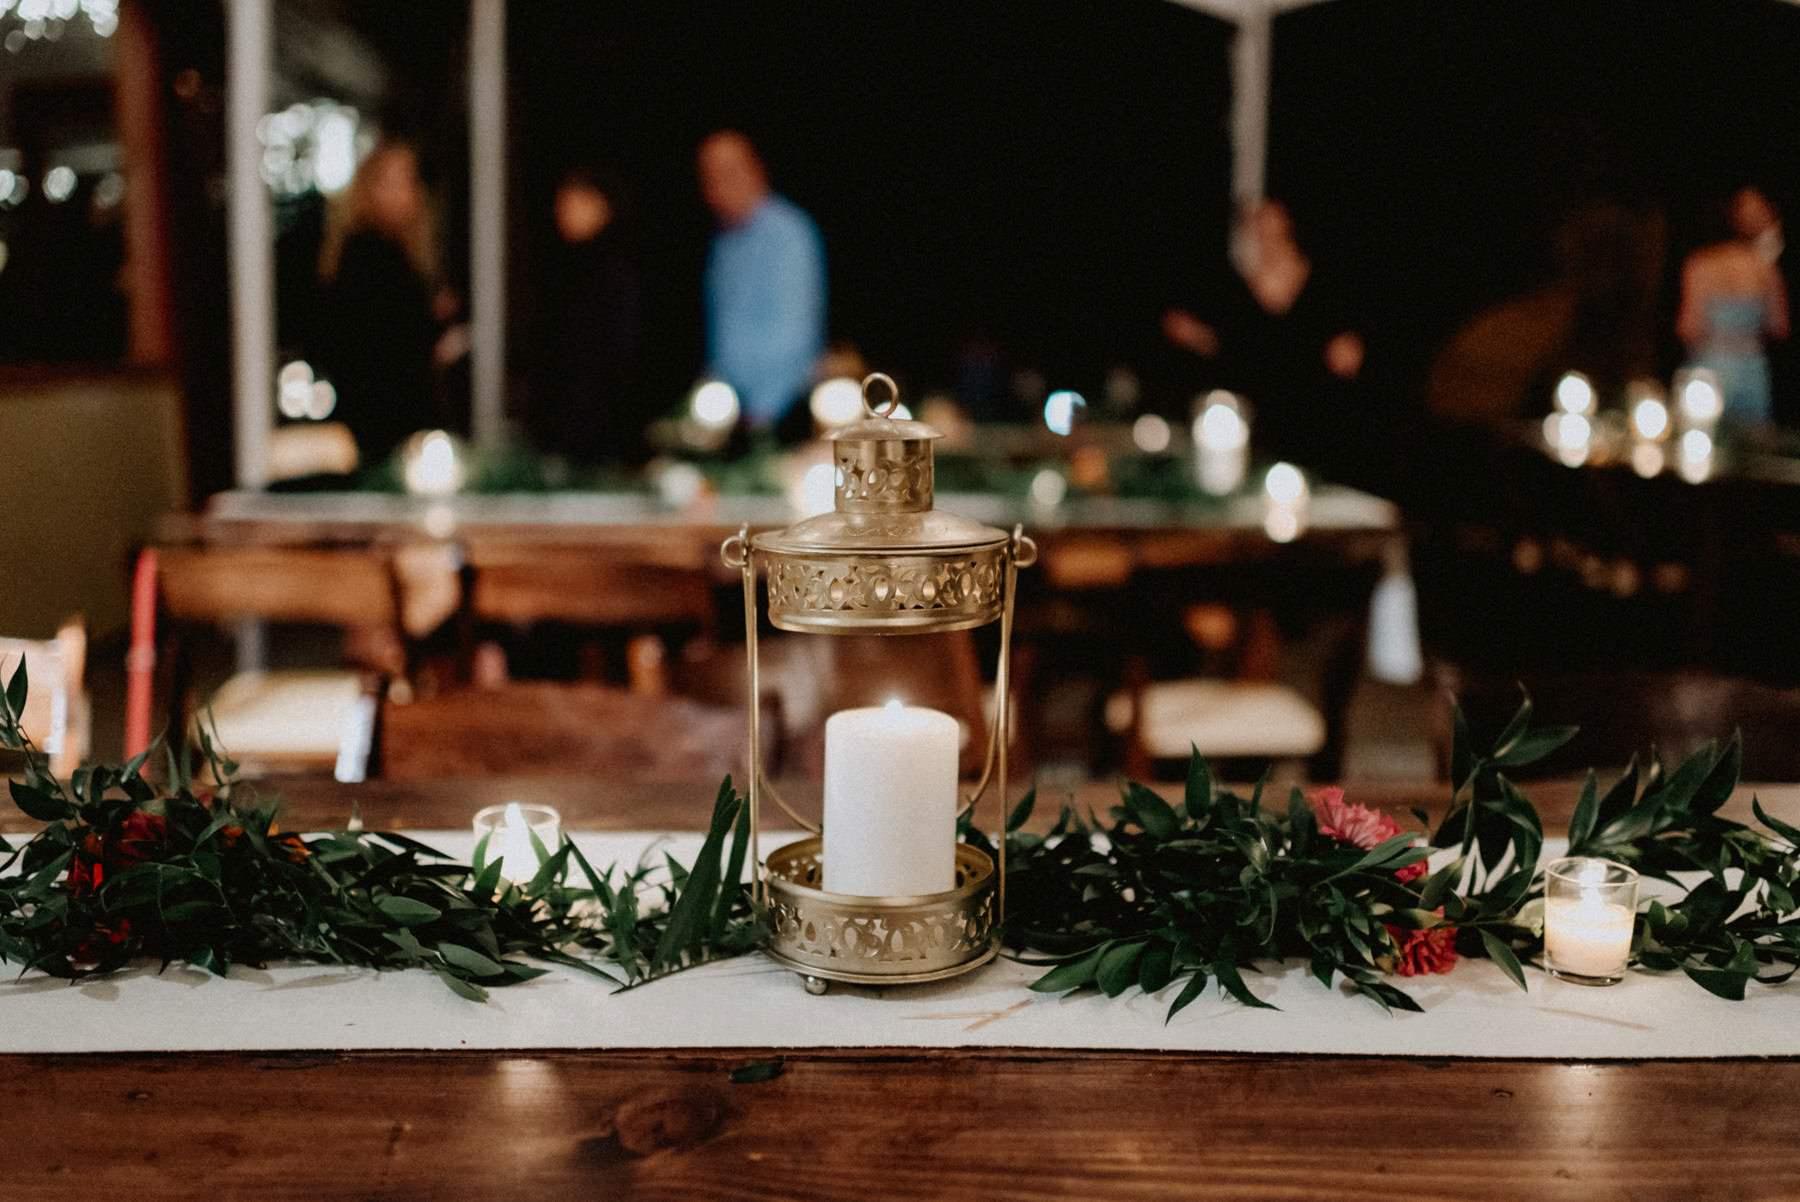 pennsylvania-private-estate-wedding-139.jpg